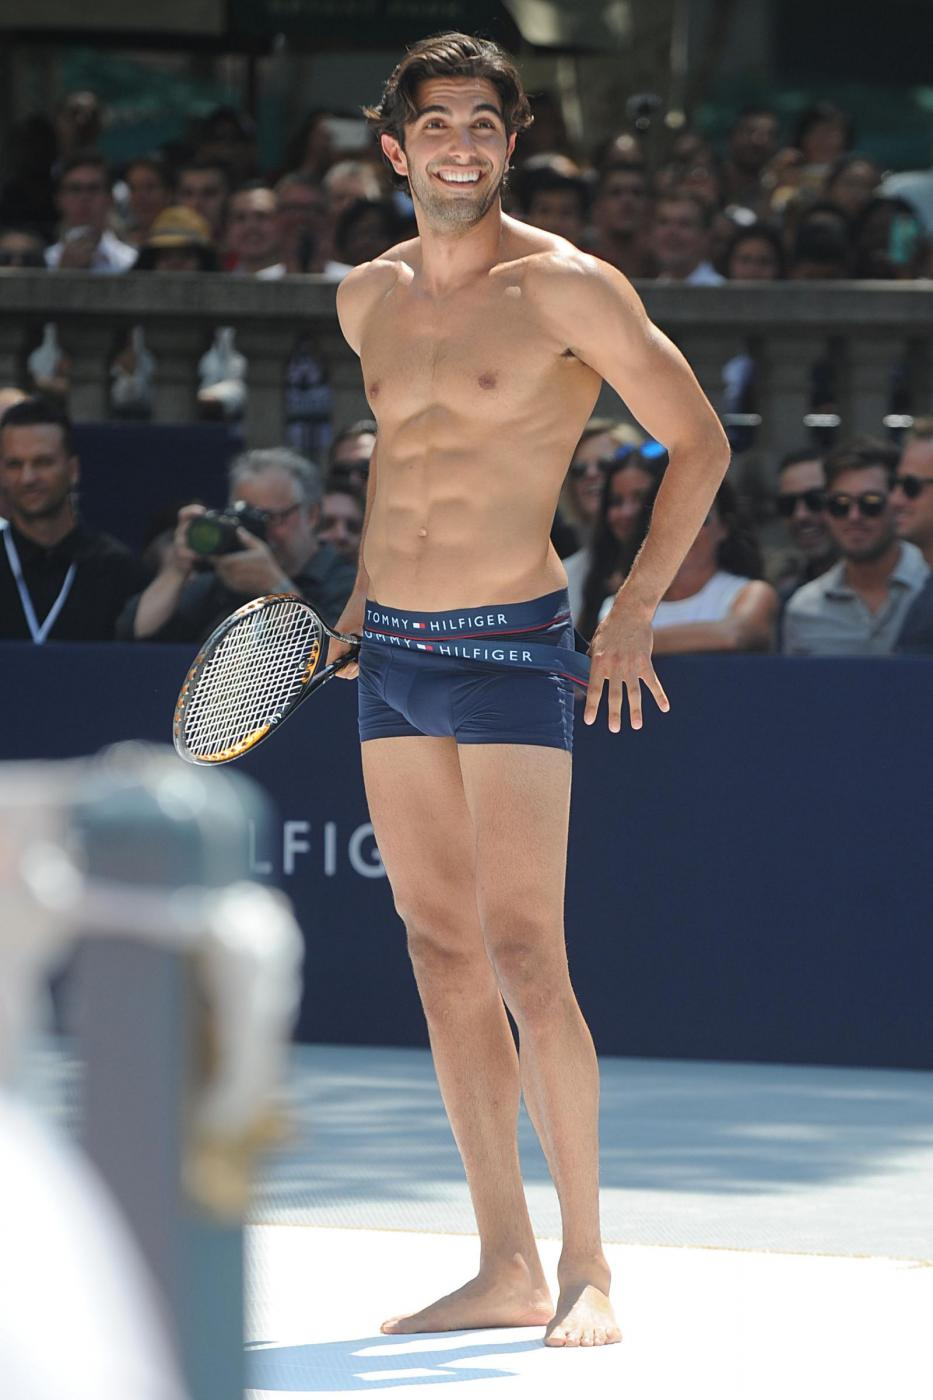 Rafael Nadal in mutande per Tommy Hilfiger VIDEO 11